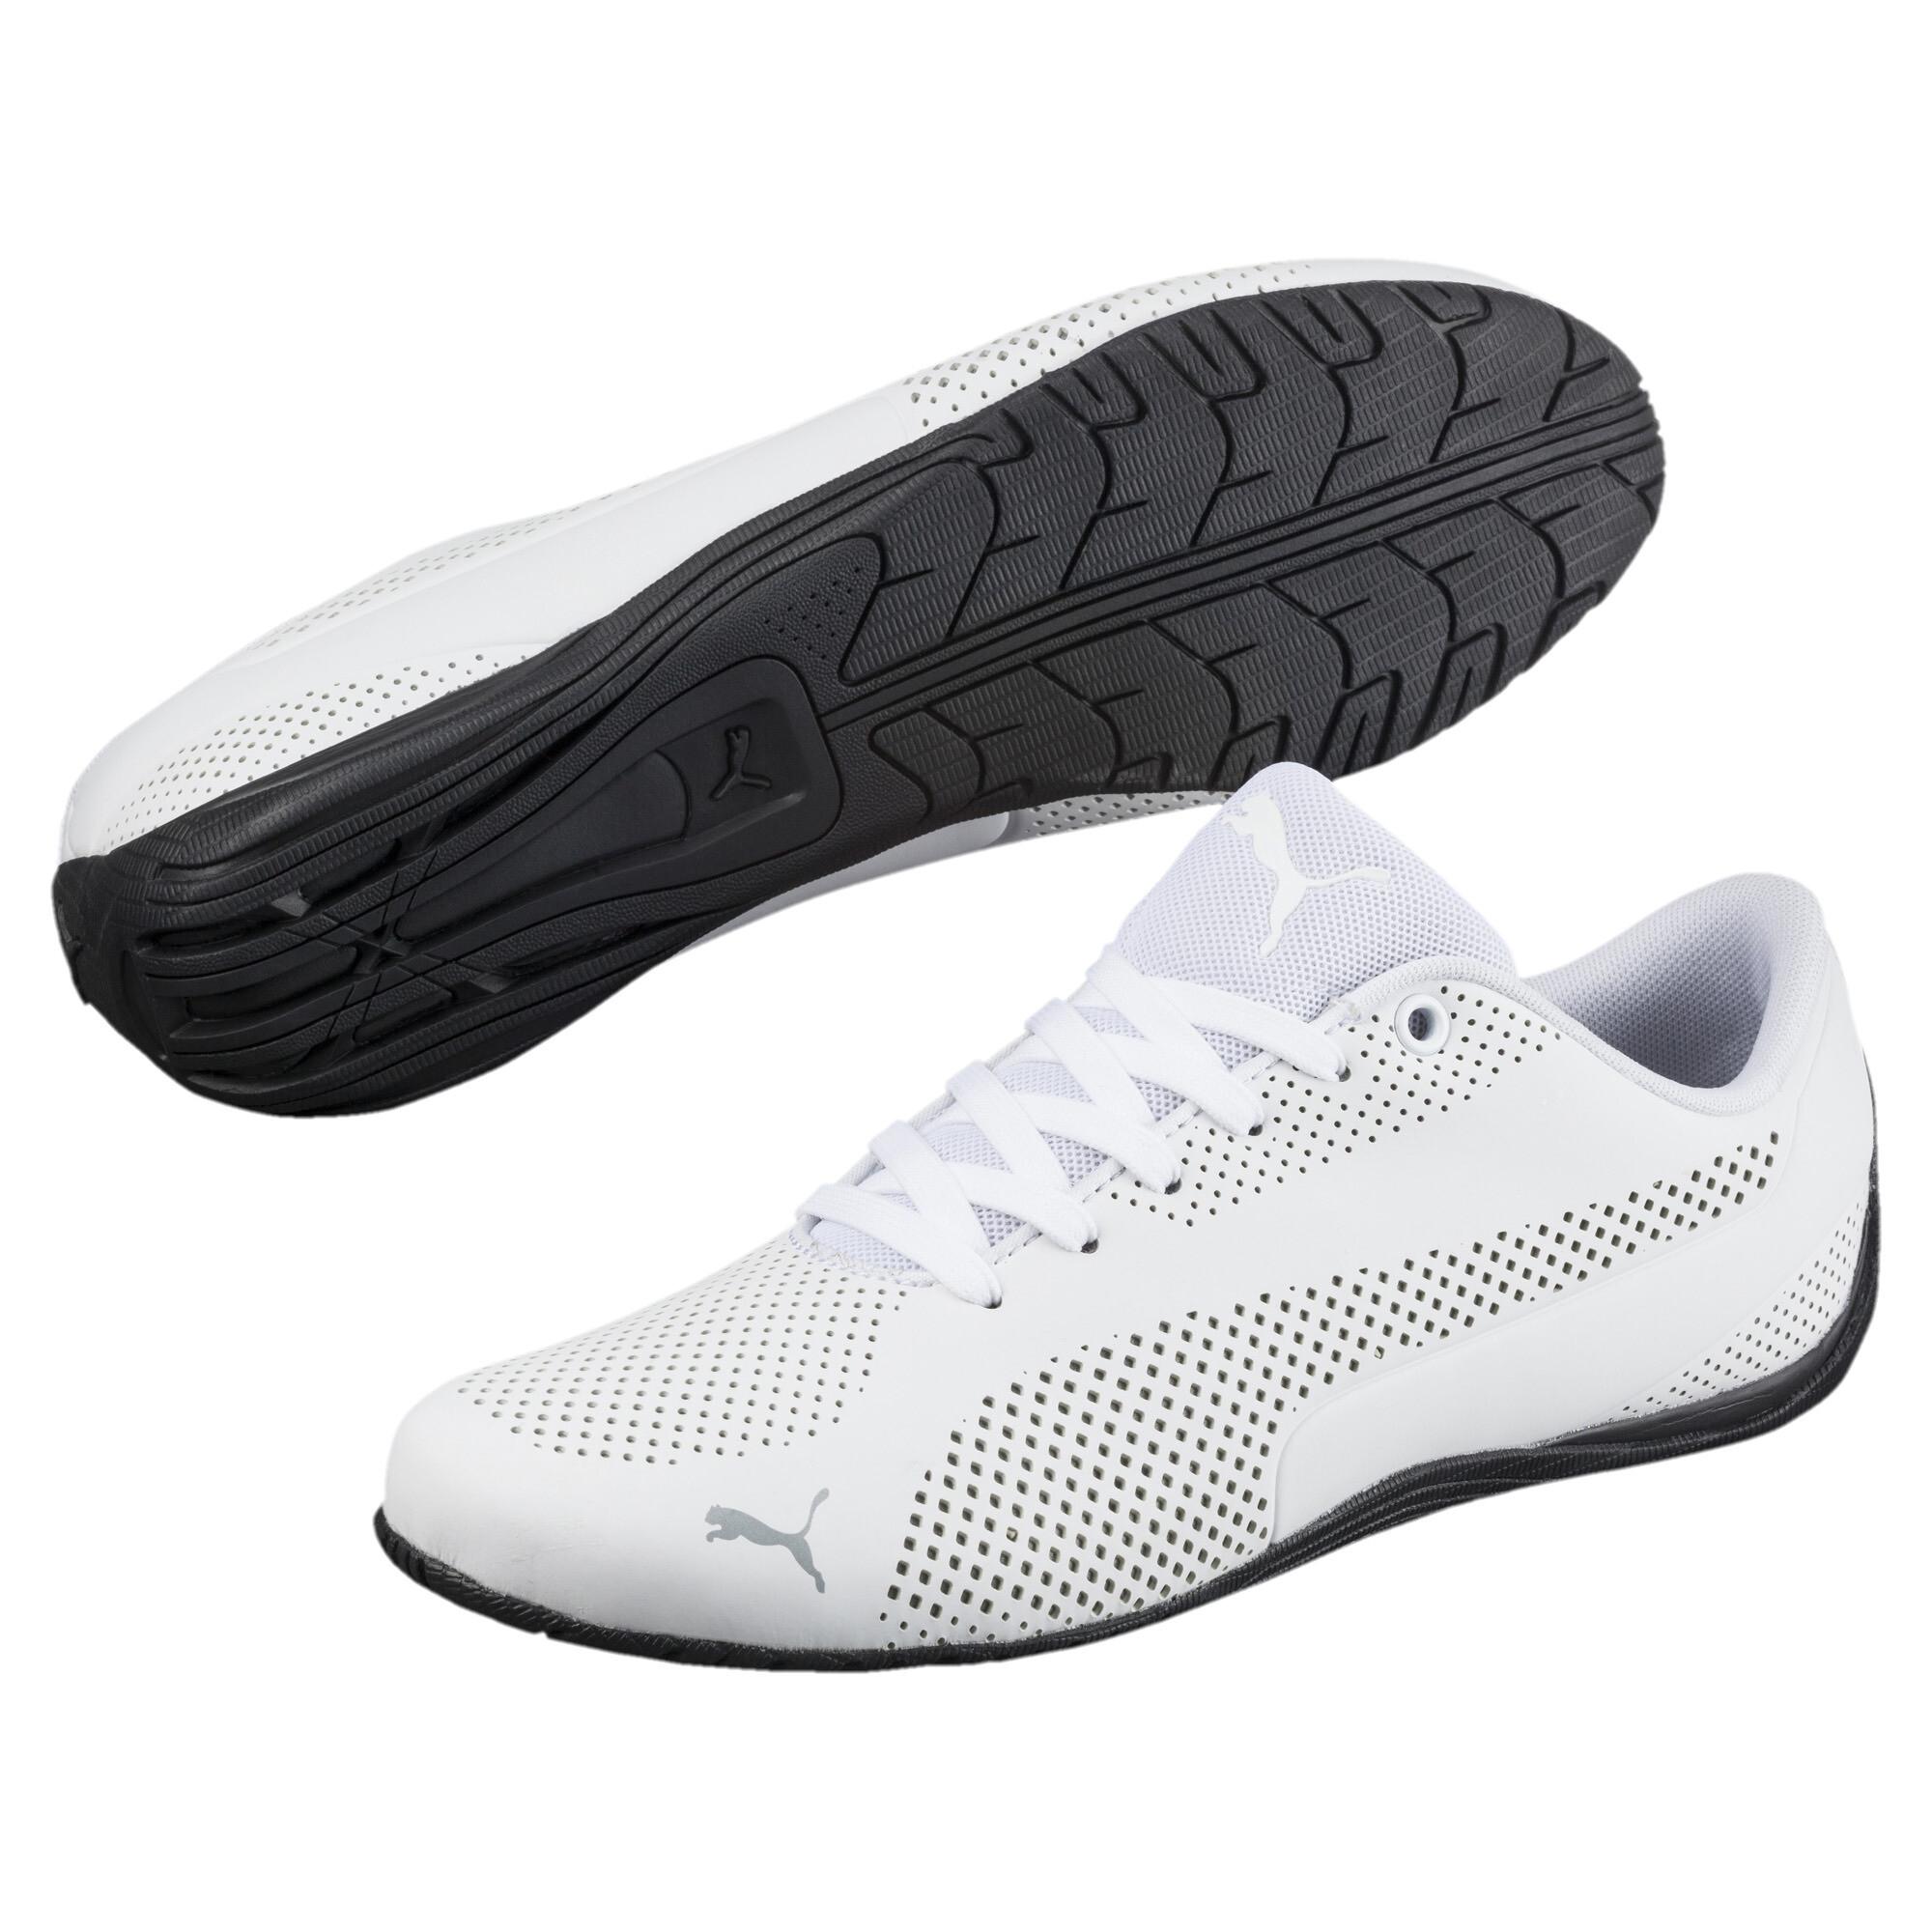 PUMA-Drift-Cat-Ultra-Reflective-Men-039-s-Shoes-Men-Shoe-Sport-Classics thumbnail 11